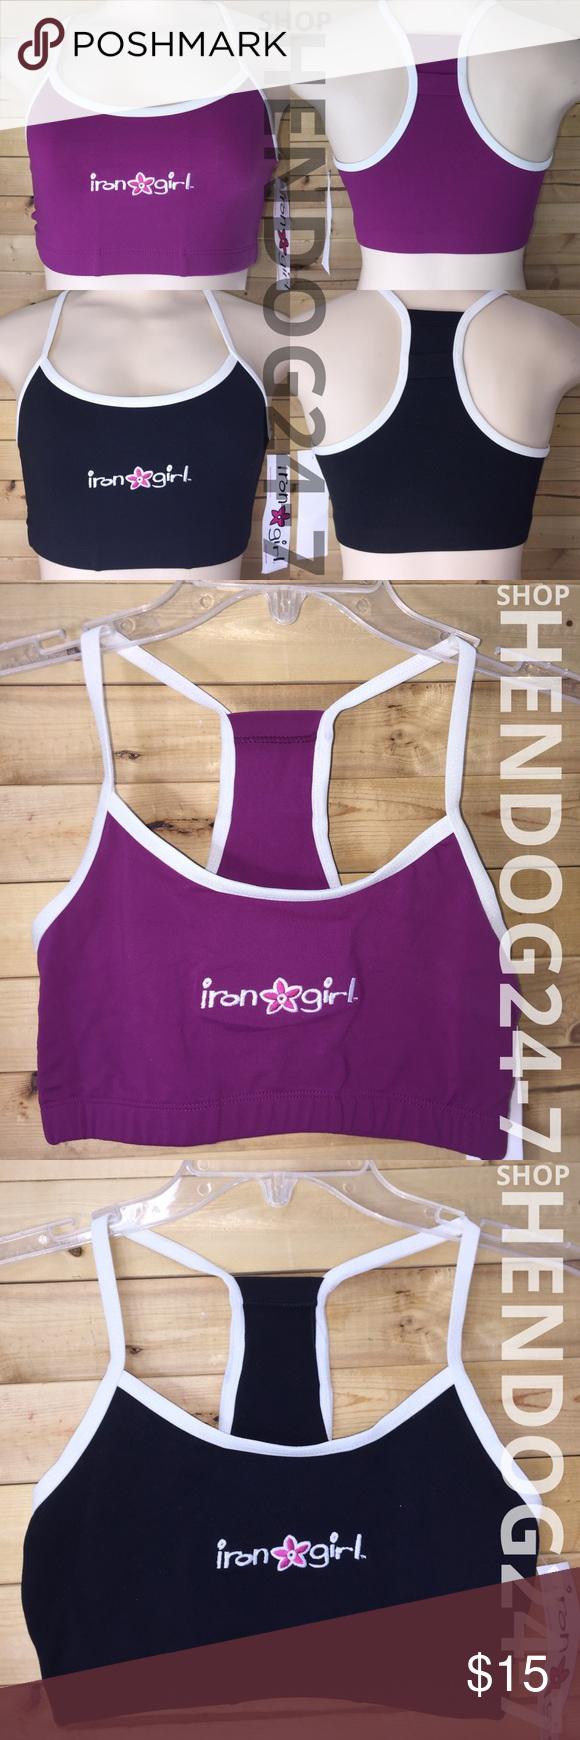 Iron girl triathlon bike run swim racerback bra nwt